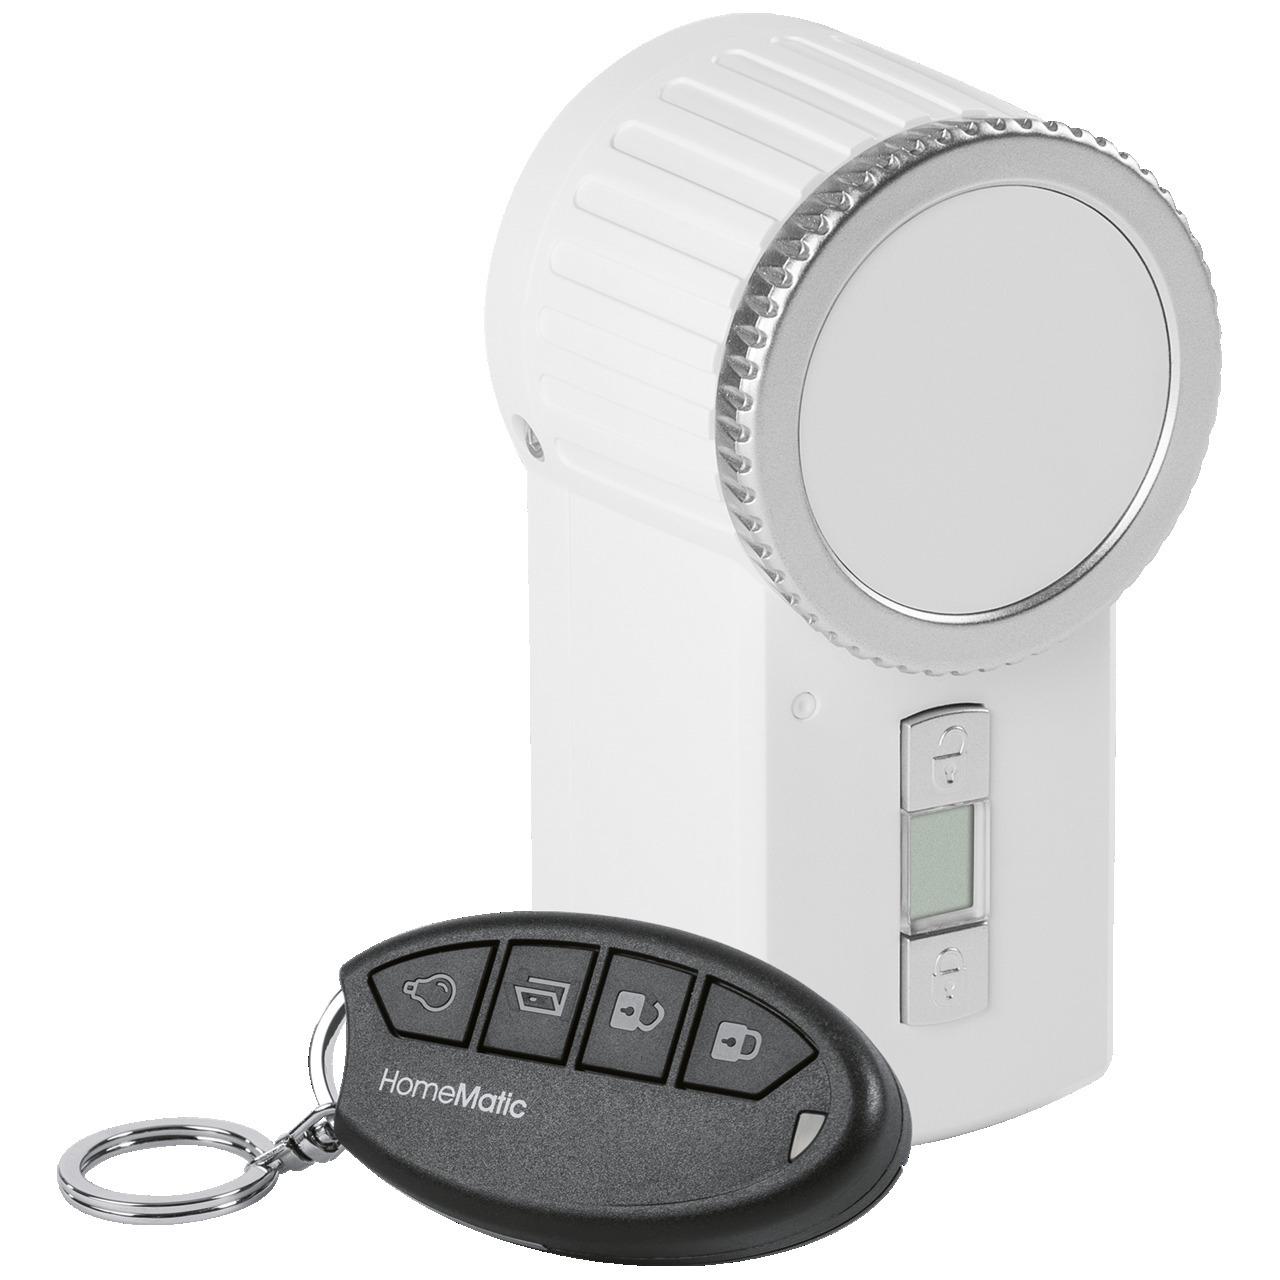 Homematic Funk-Türschlossantrieb KeyMatic- weiss inkl- Funk-Handsender HM-Sec-Key